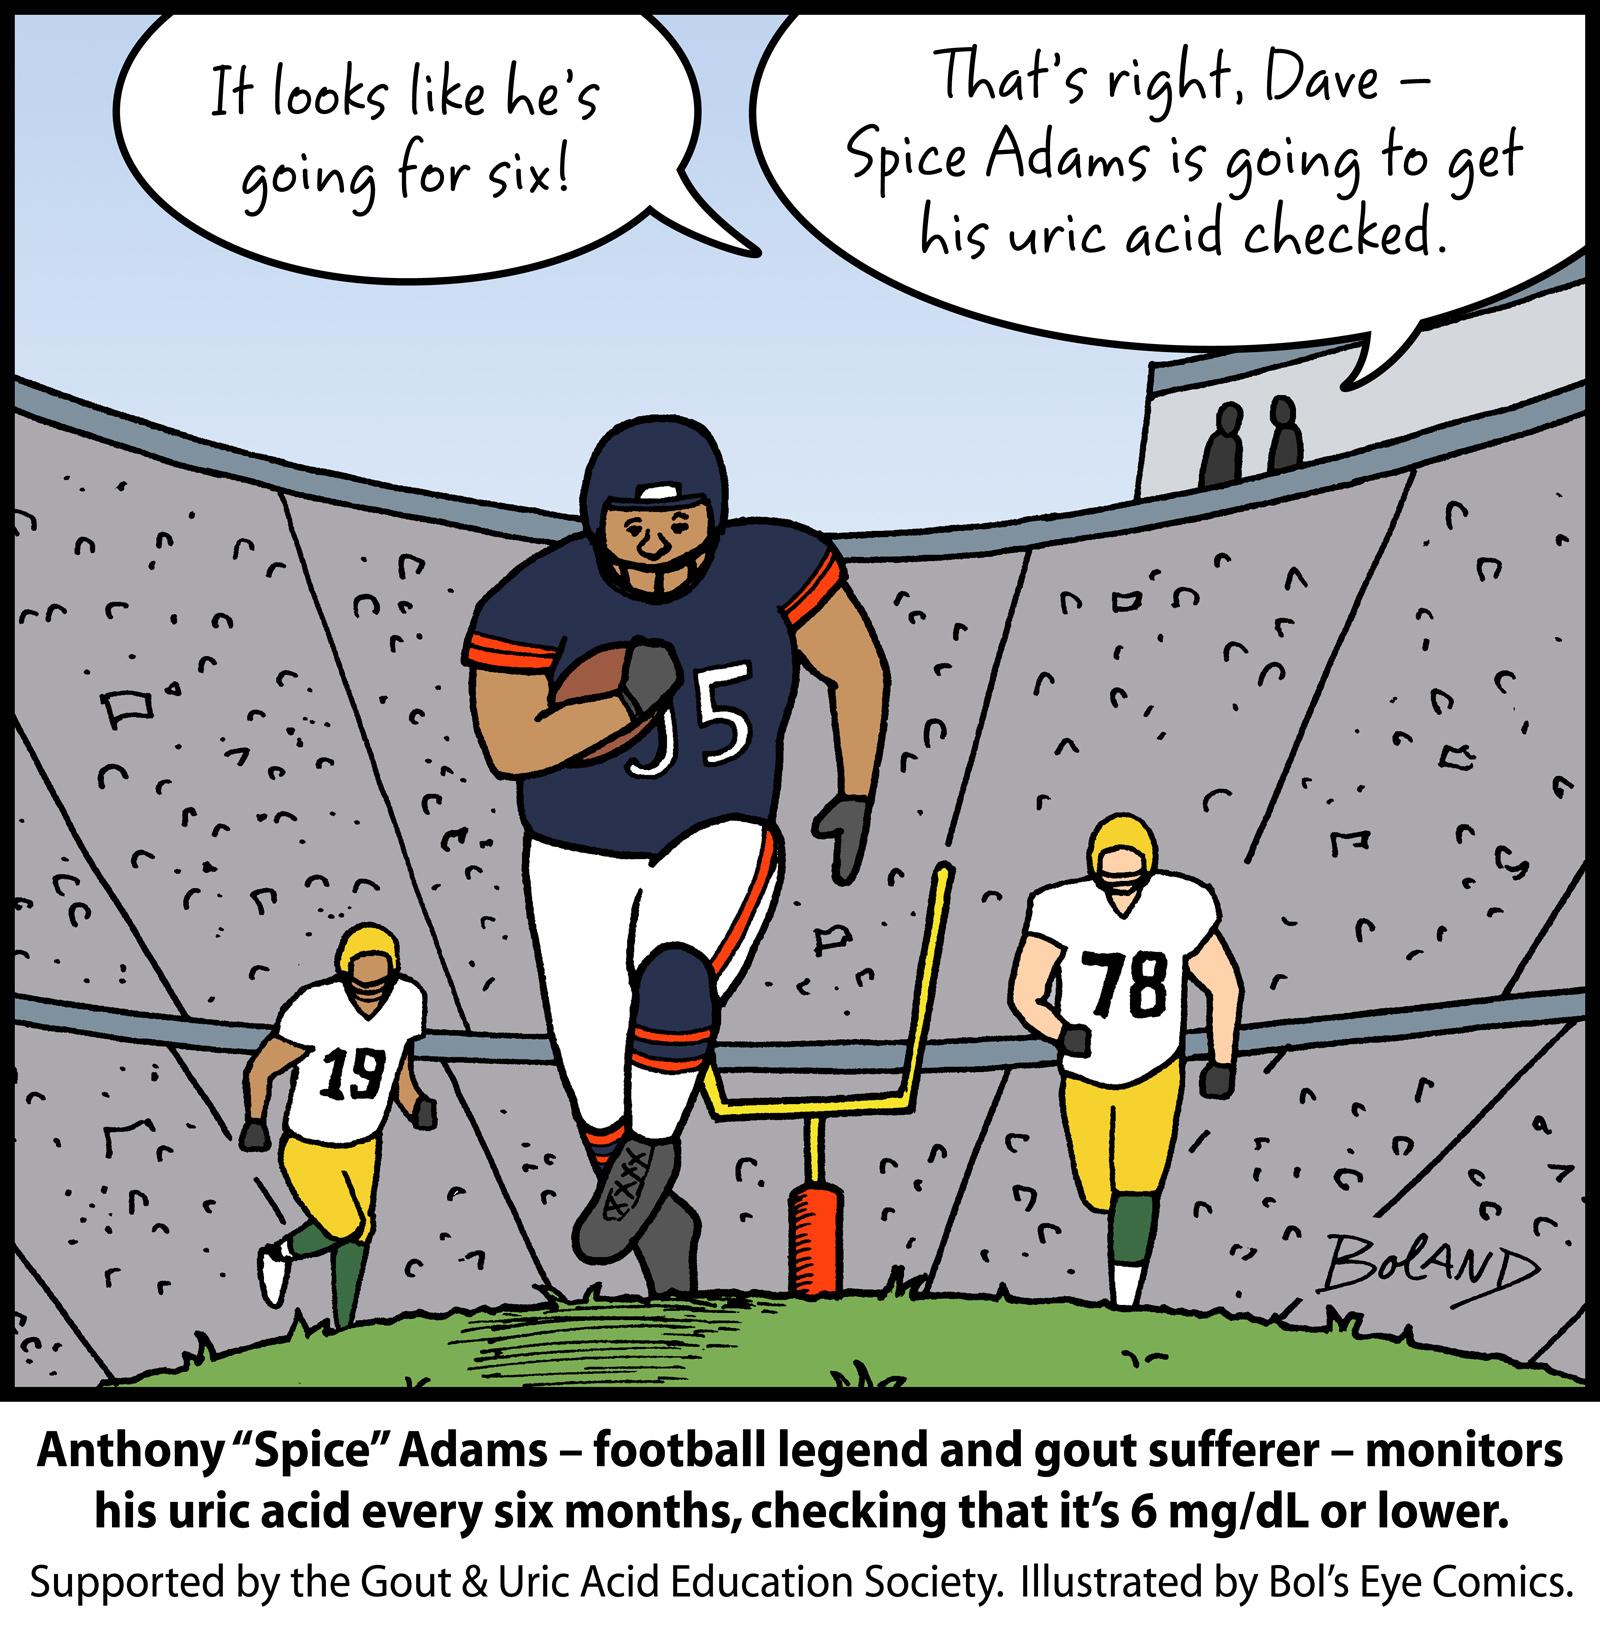 Gout-cartoon-14_Anthony-Adams_CLR-web